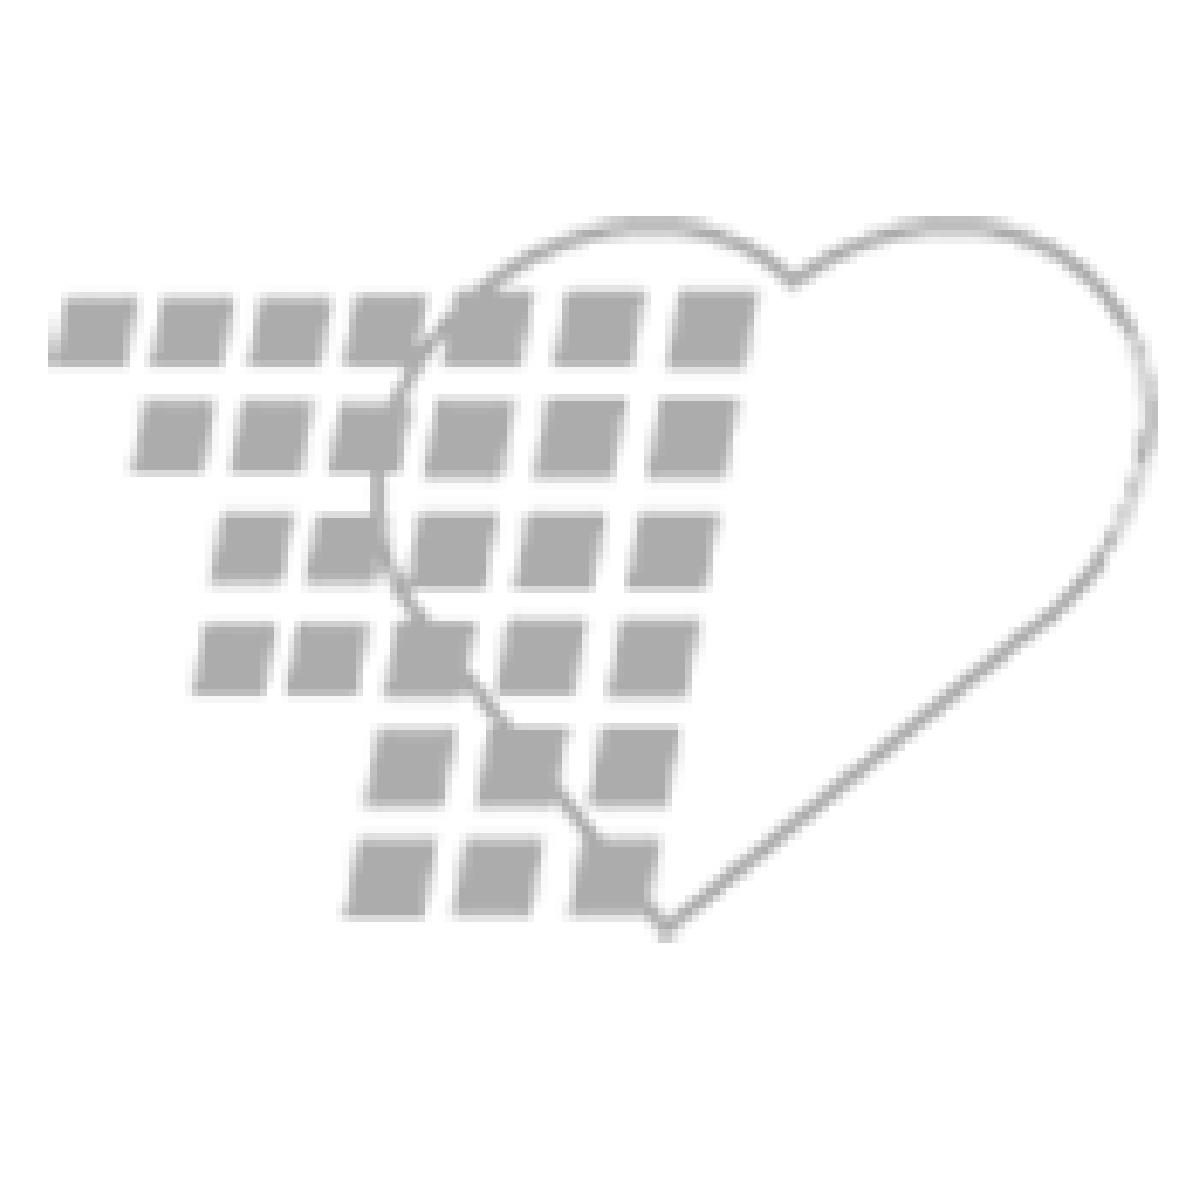 05 84 1003 Pocket Nurse Draw Sheet 54x 72 Non Returnable